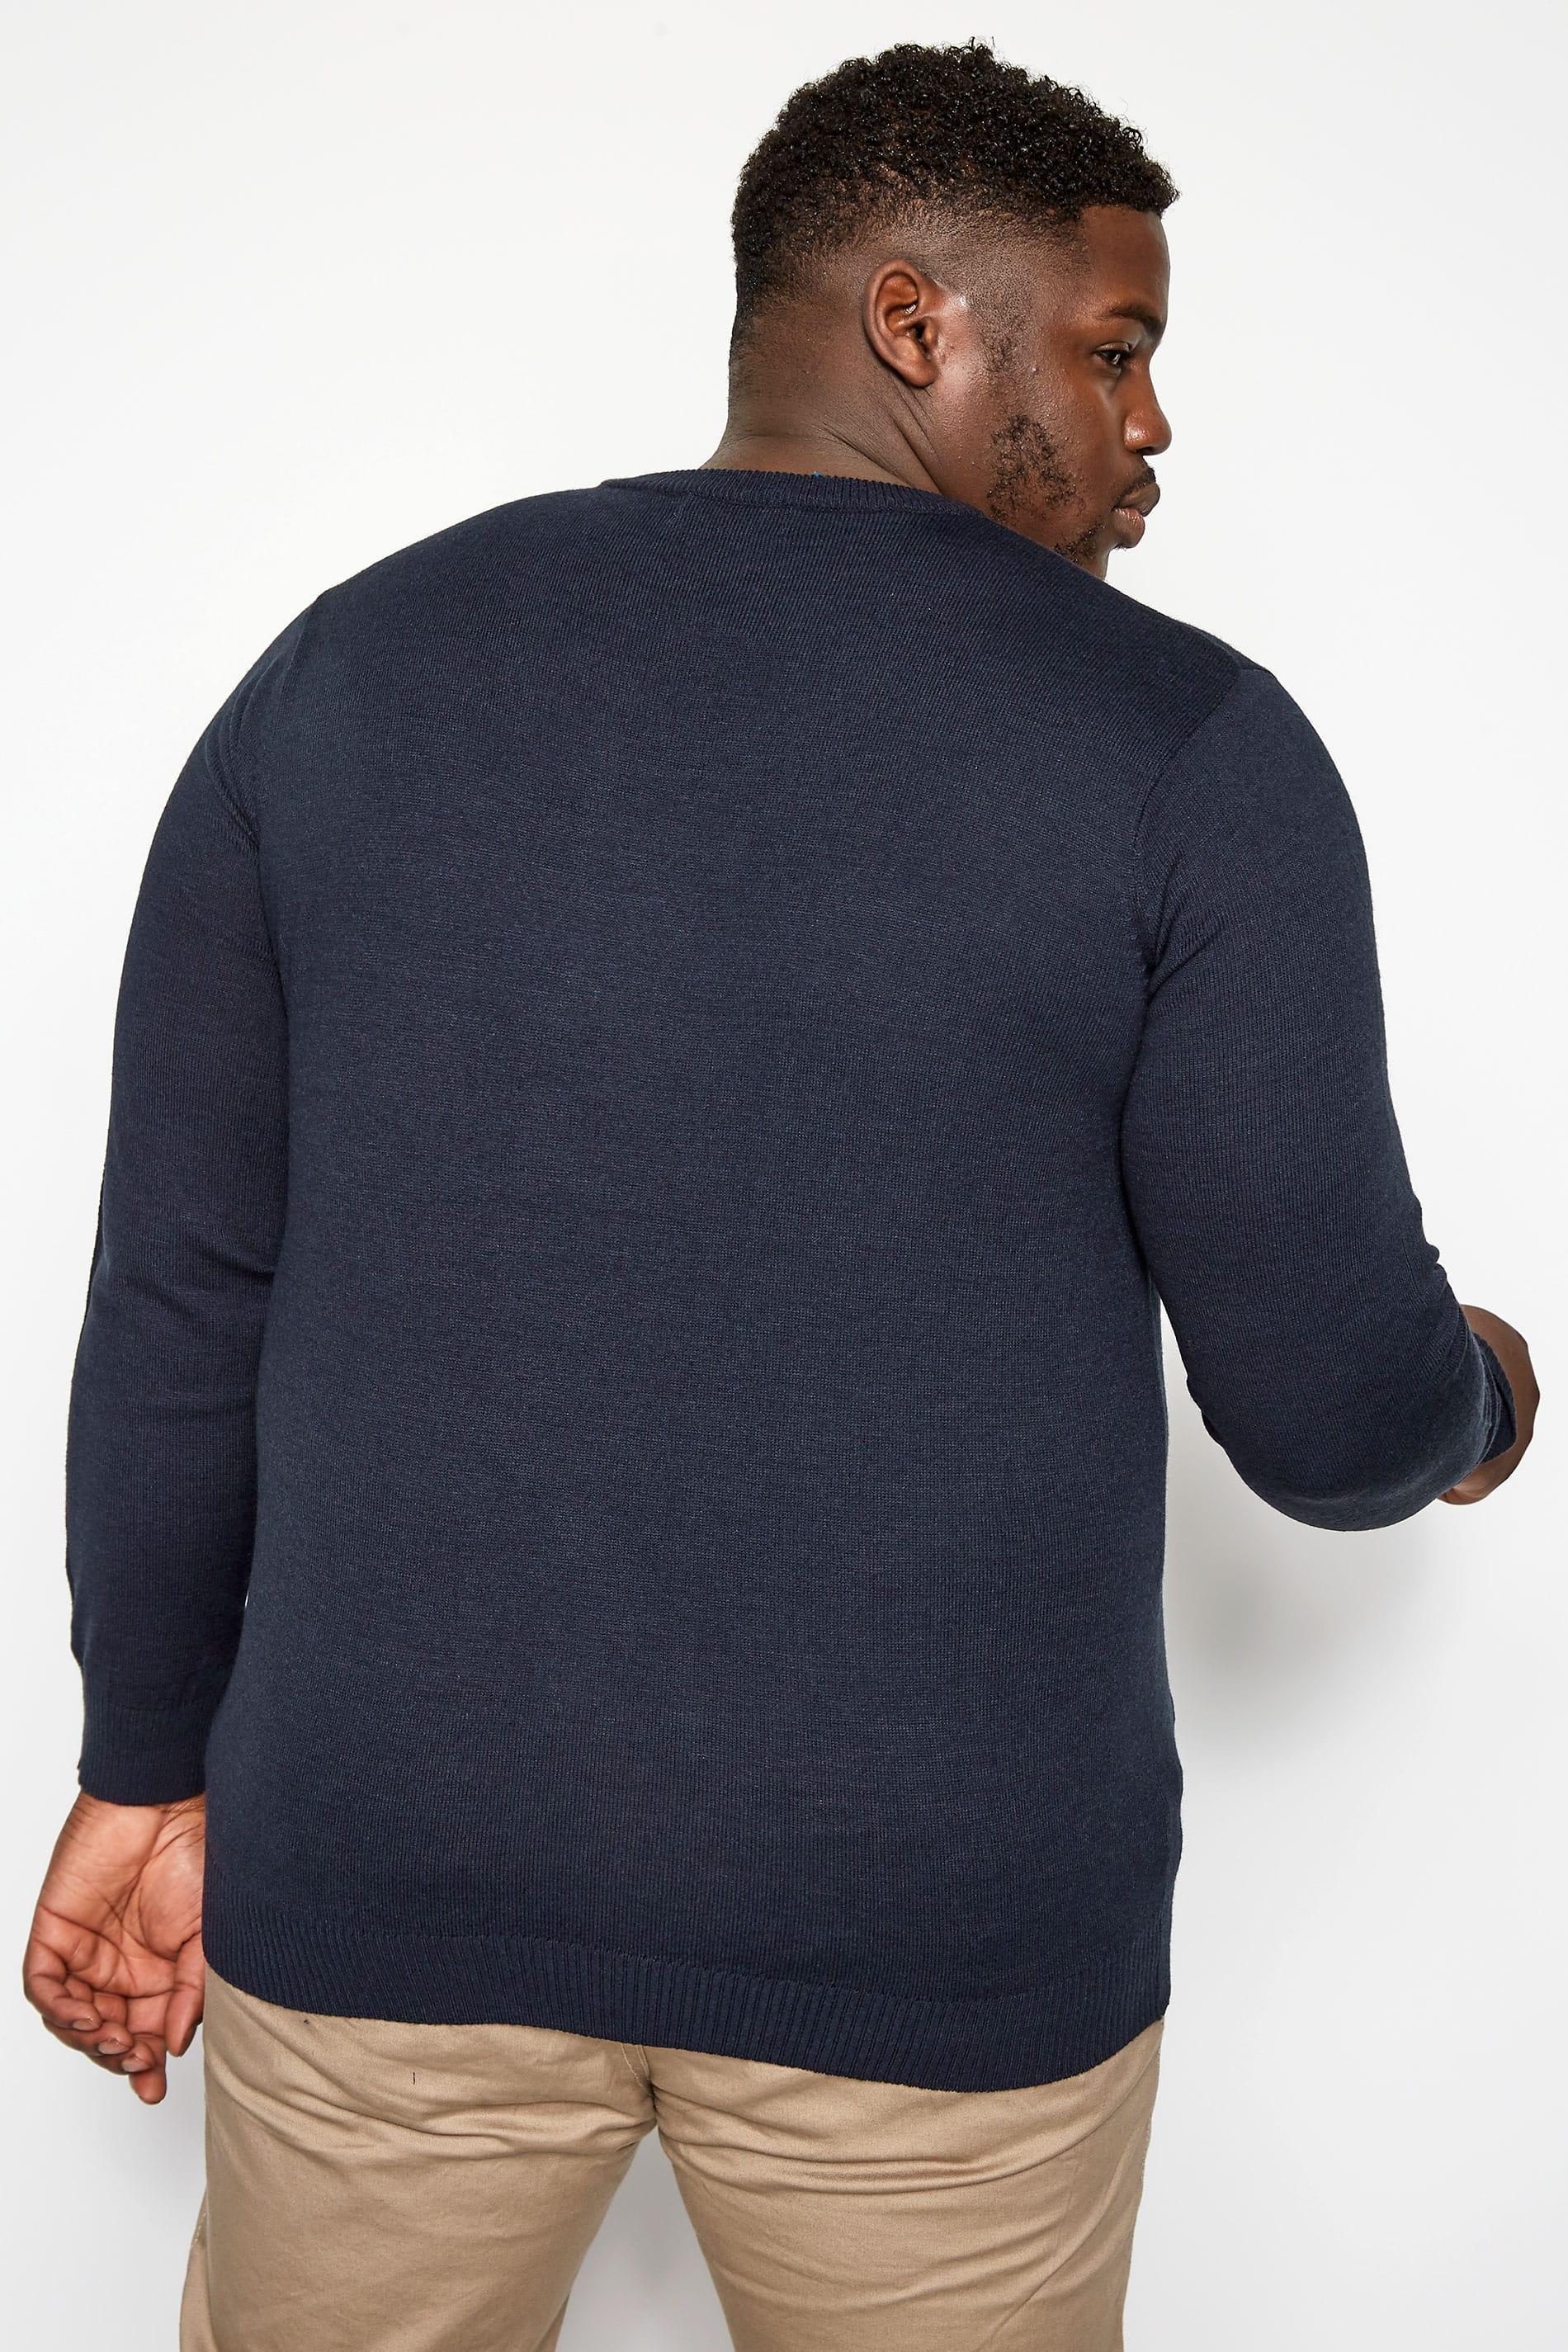 Badrhino Mens Black V-neck Fine Knit Jumper